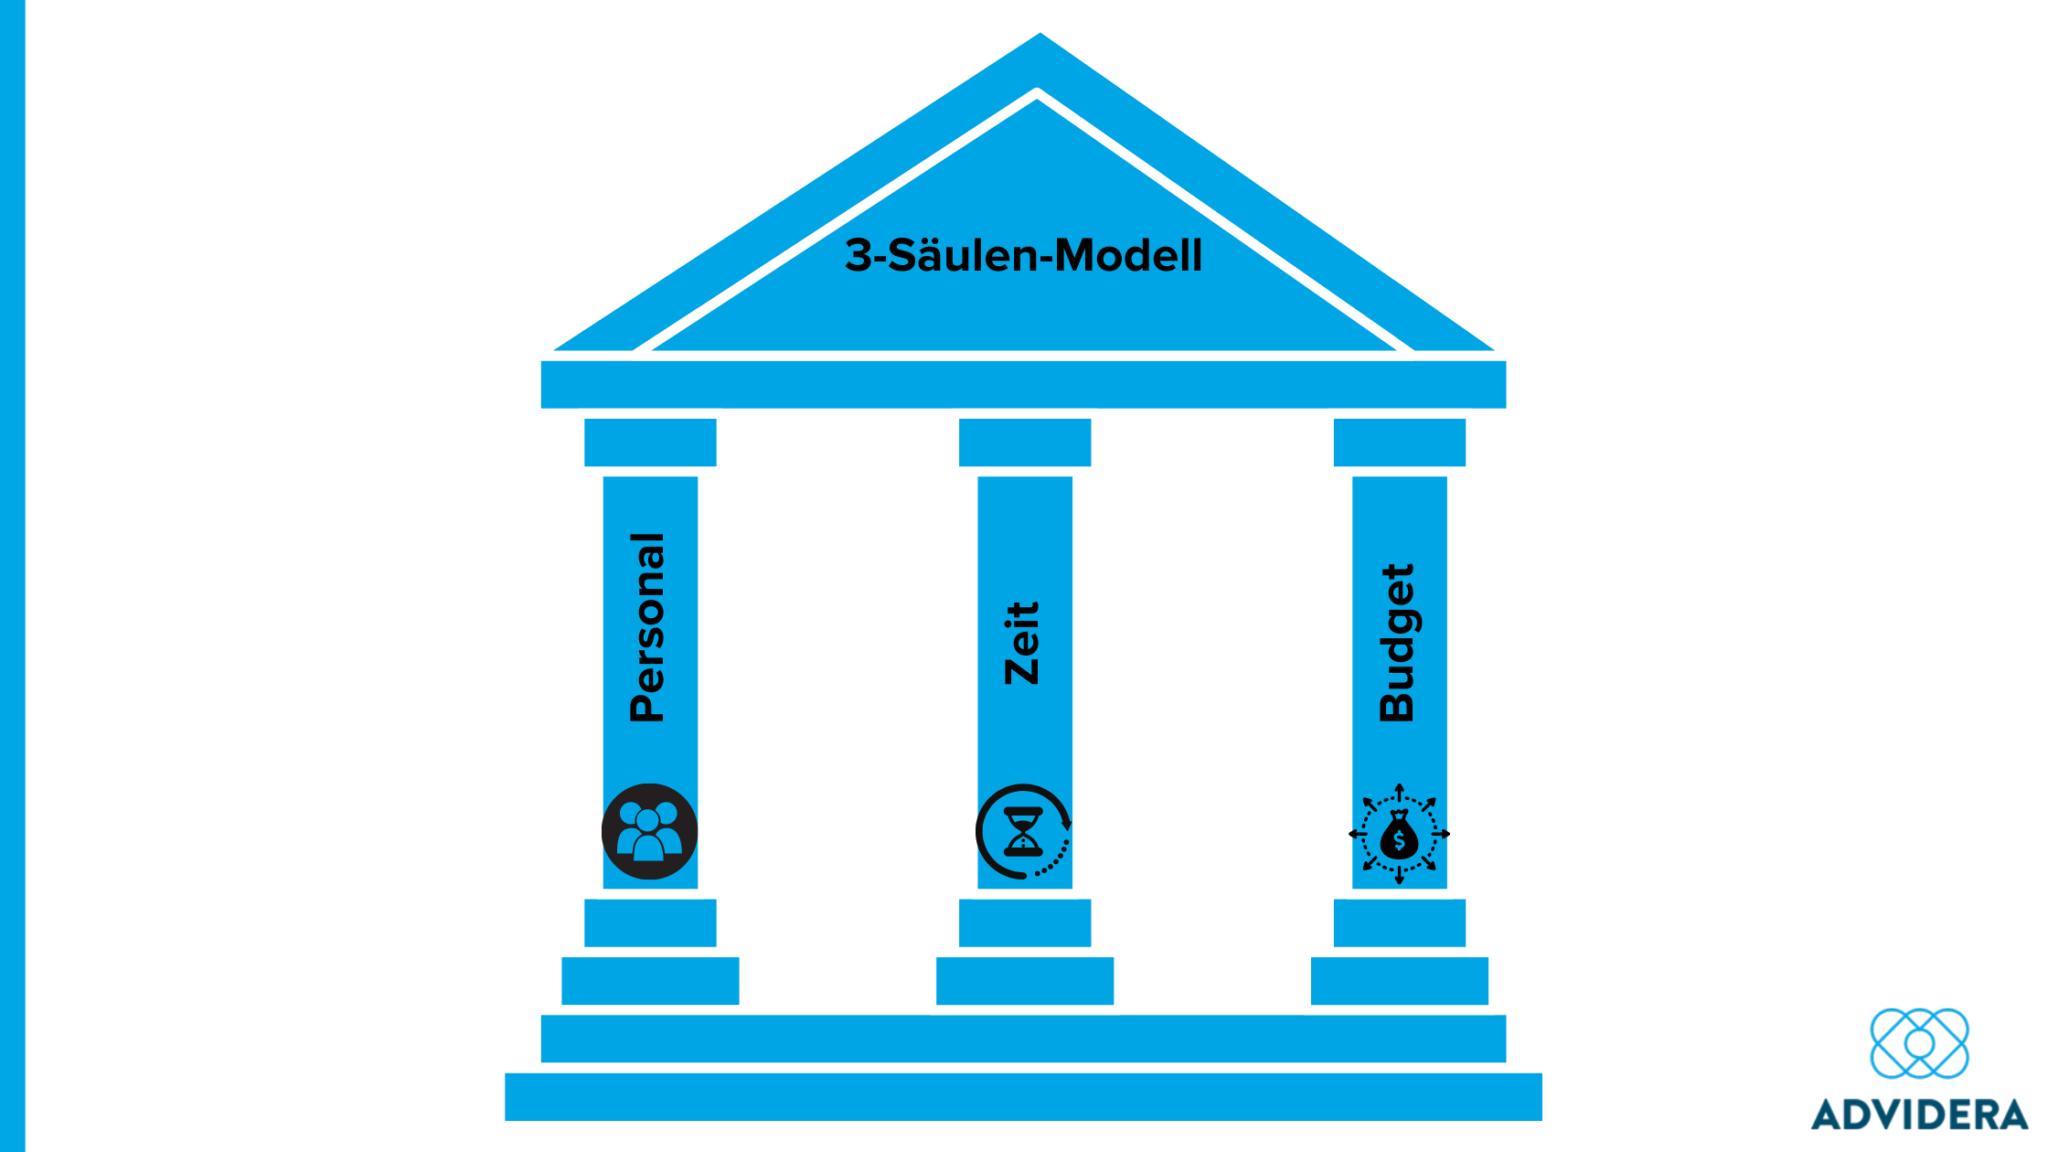 Outreach-3-Saeulen-Modell